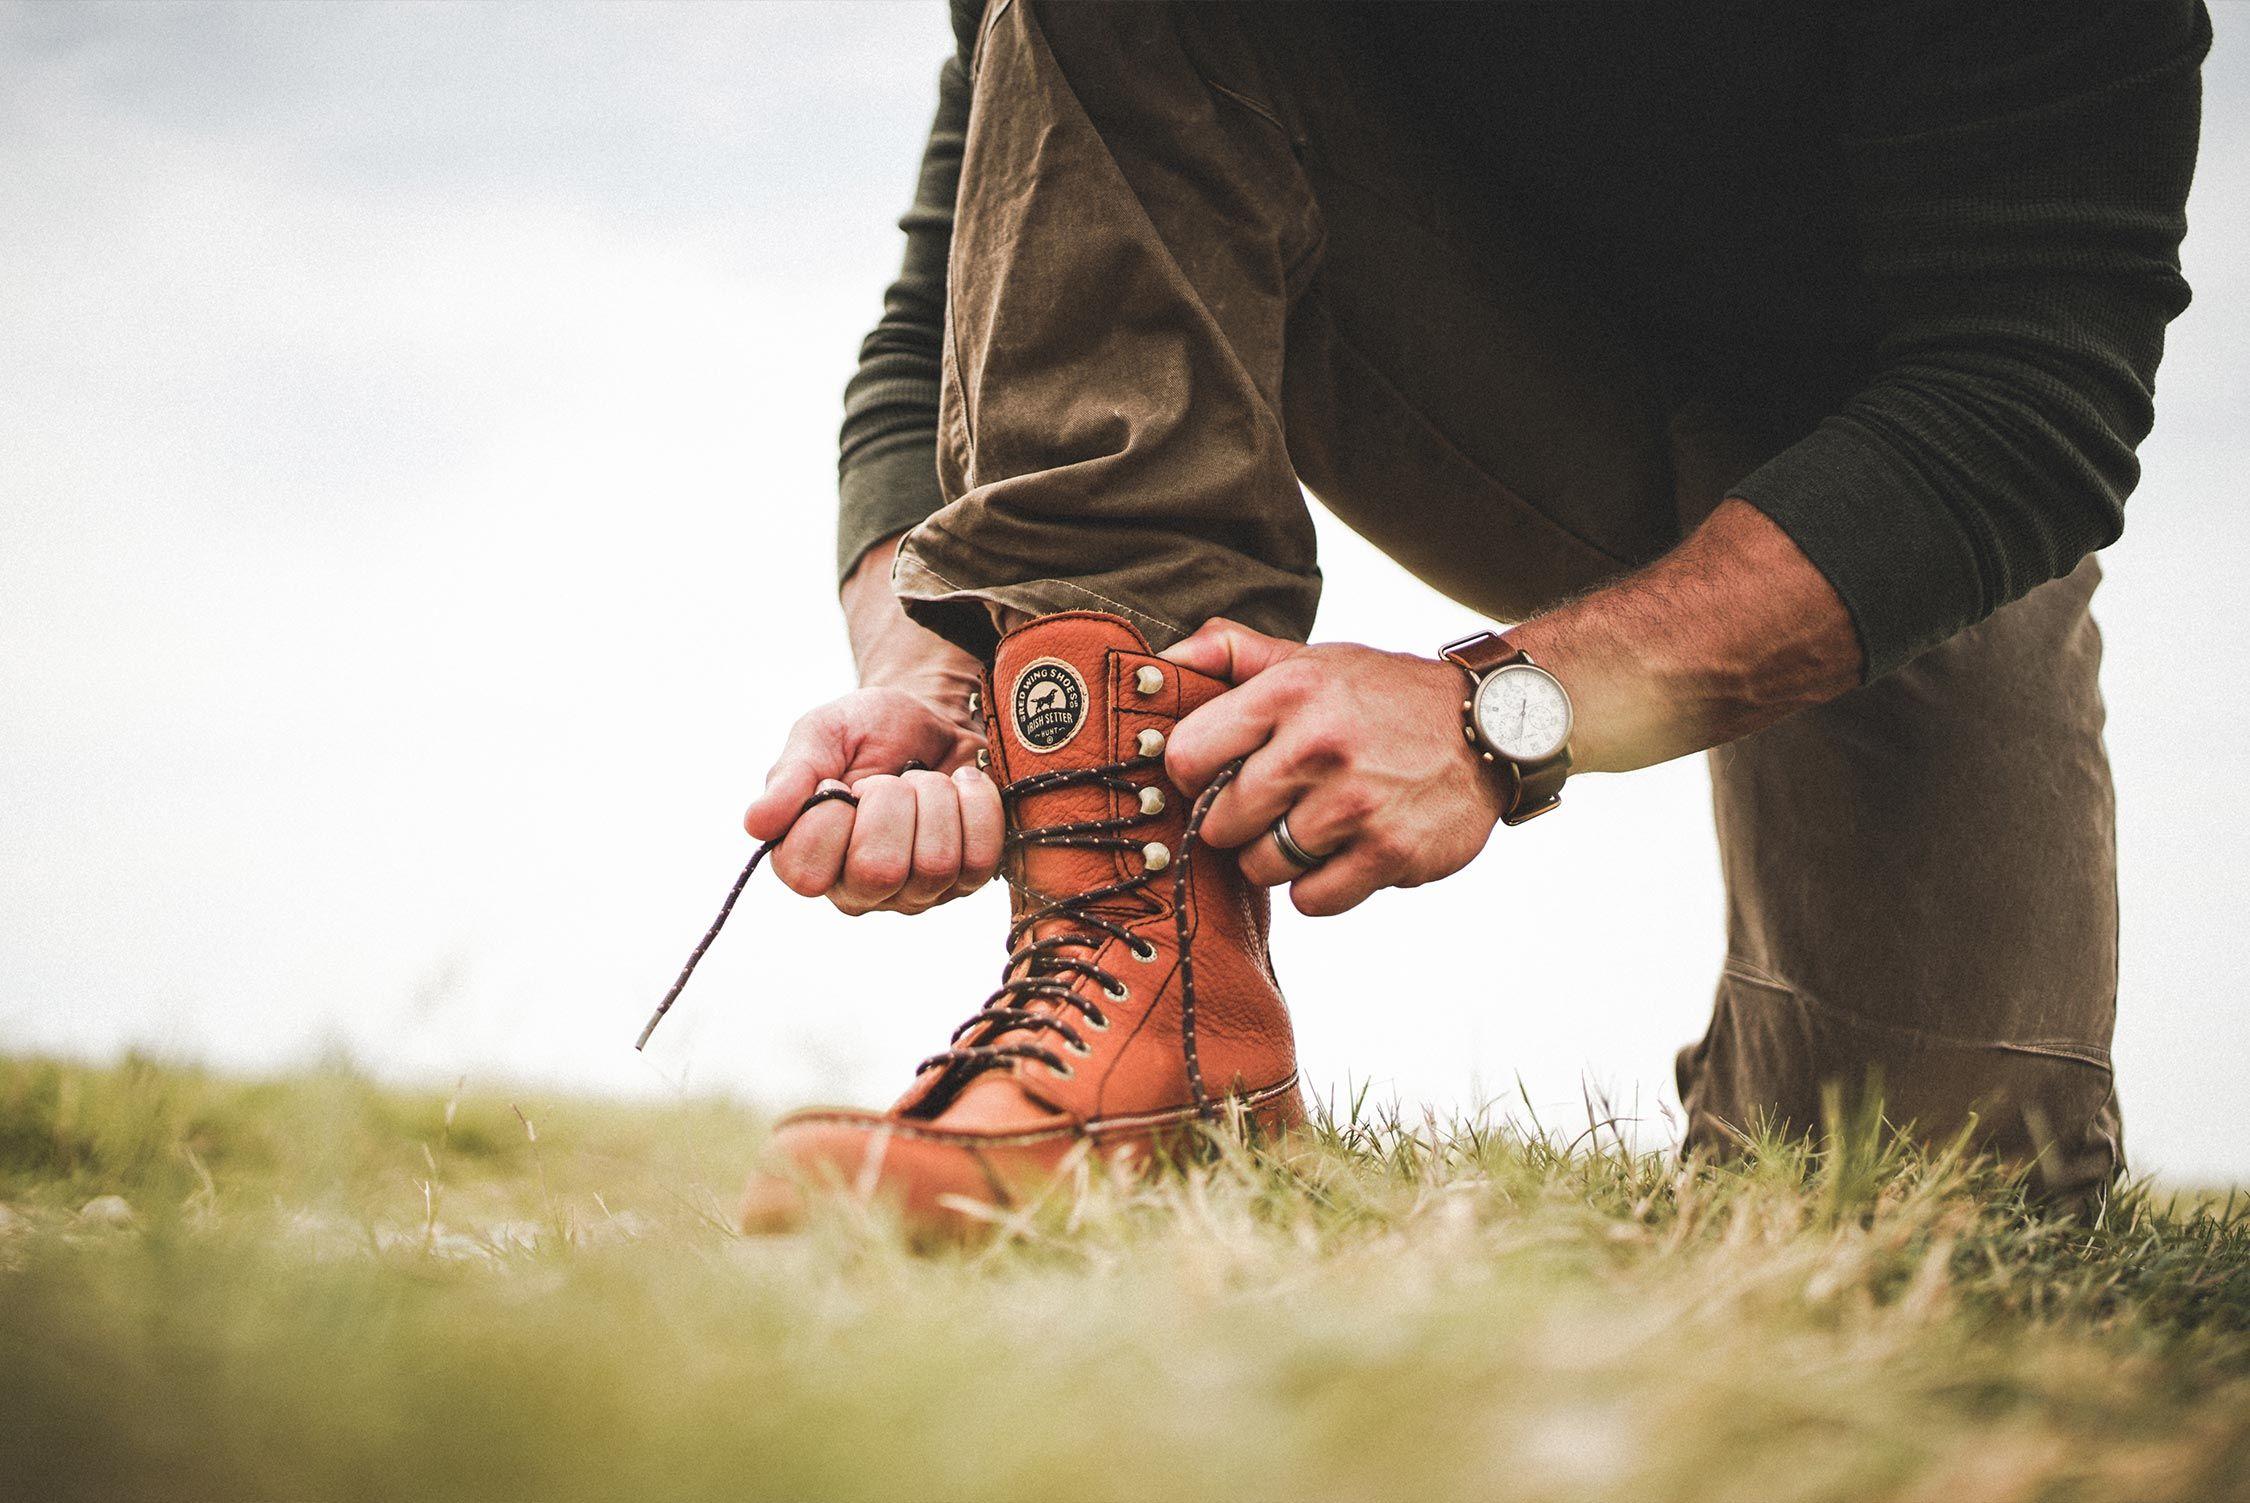 a3edfc3b06 Irish Setter Wingshooter 894 Boots on Modern Huntsman. Men s outdoor  fashion. Top hunting gear.